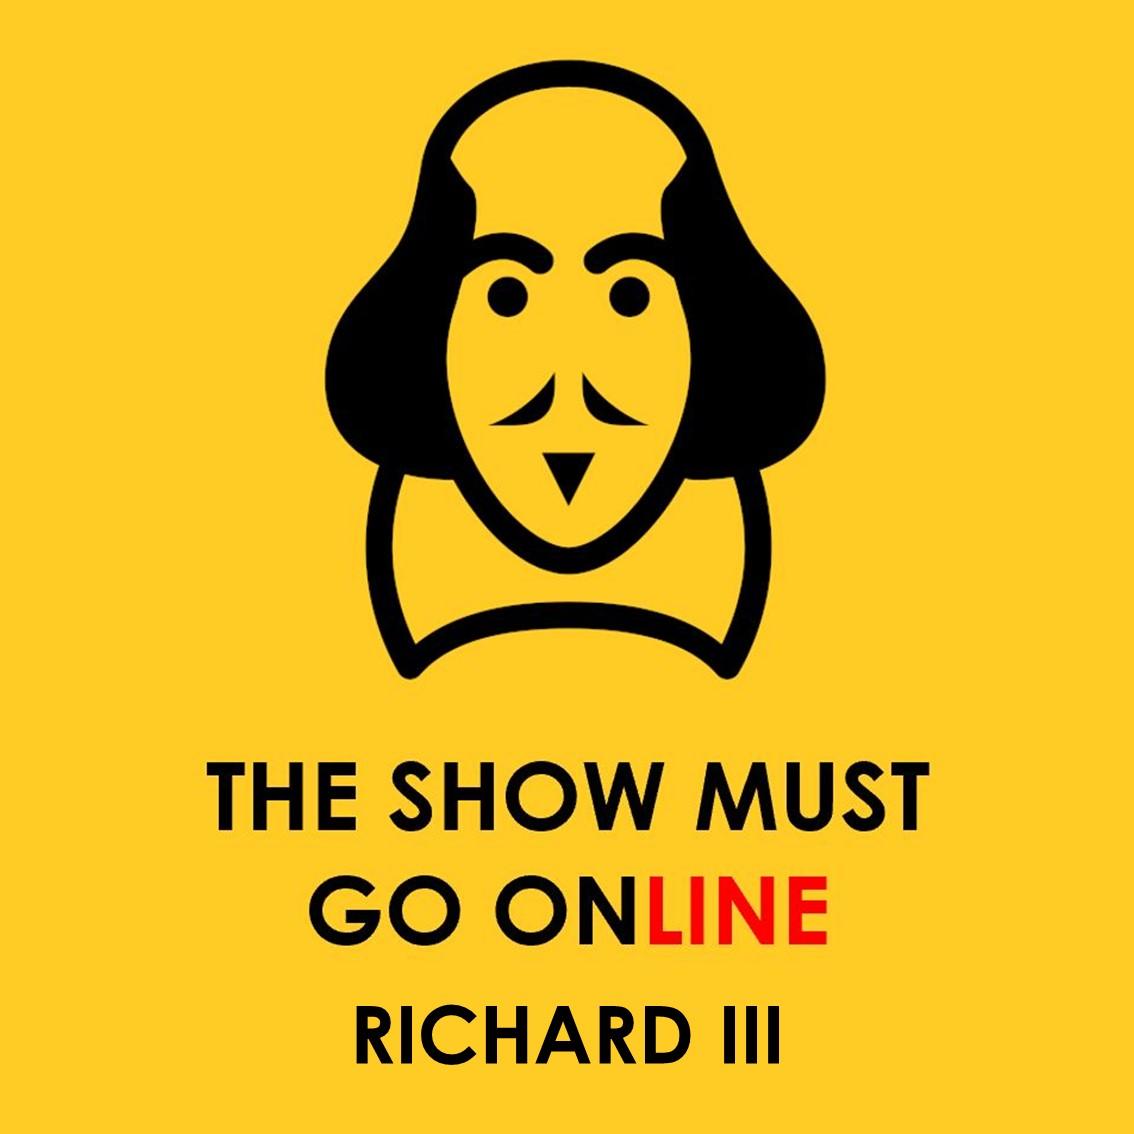 The Show Must Go Online – Richard III Thumbnail